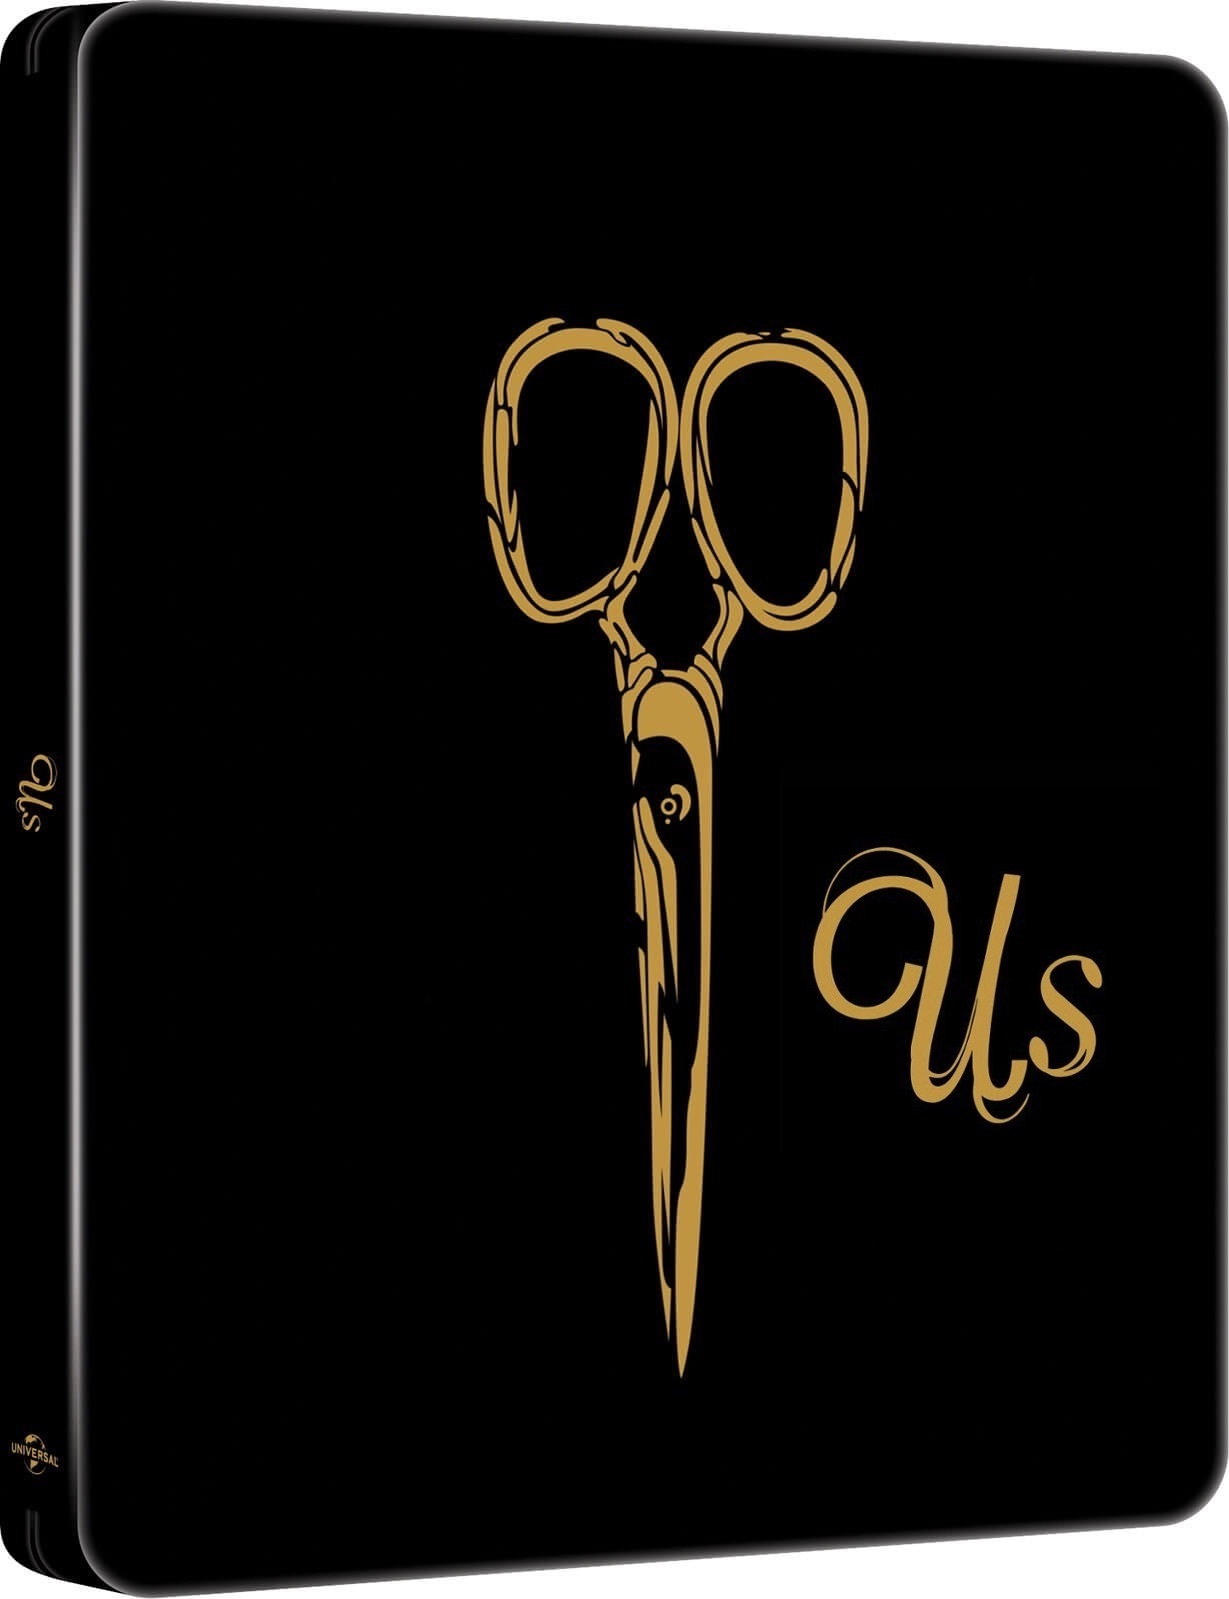 Us (SteelBook)(4K Ultra HD Blu-ray)(Pre-order / Jun 18)